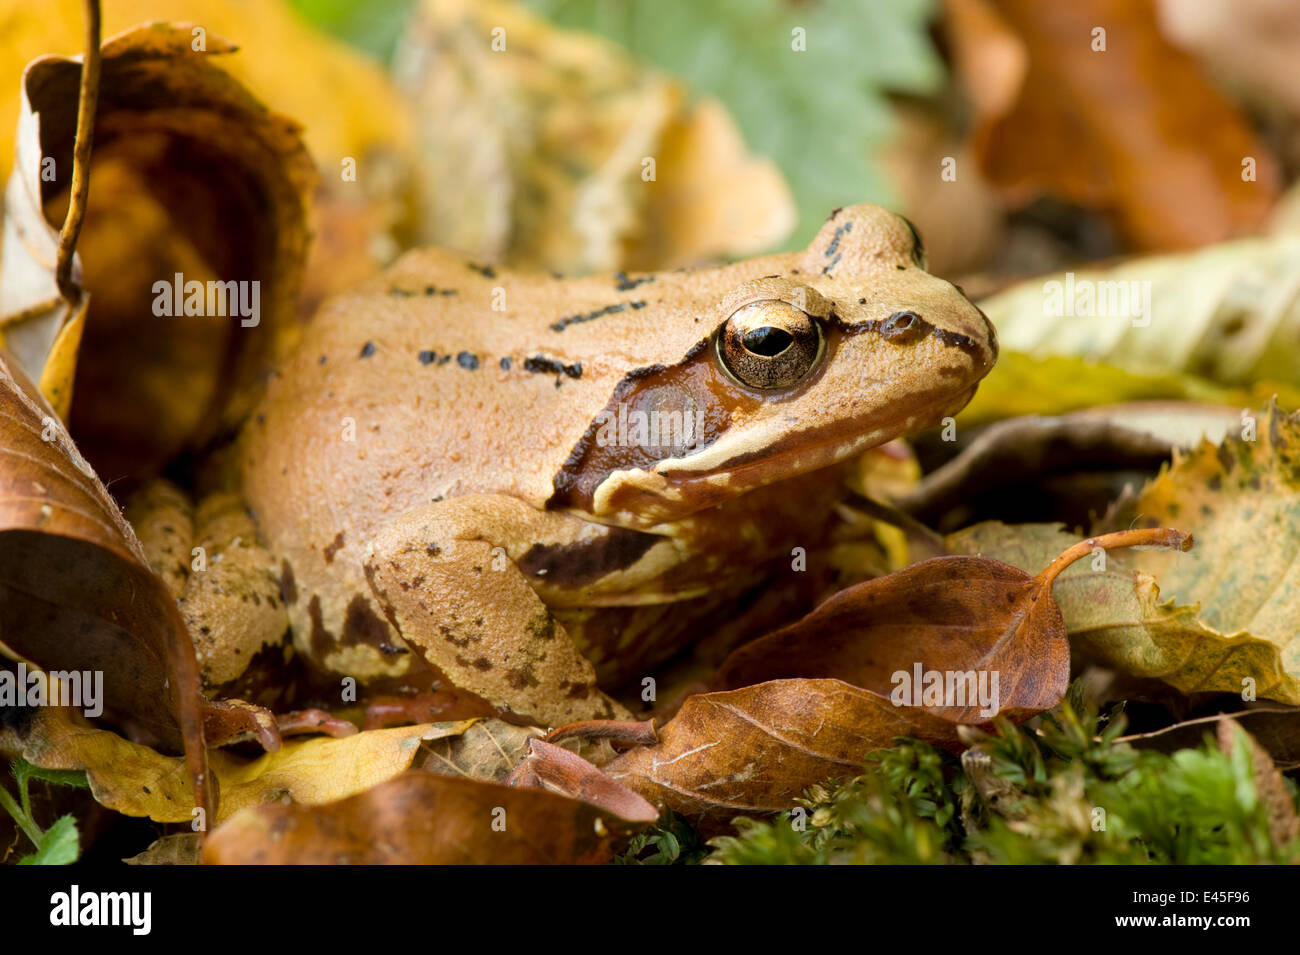 Dead Frog Stockfotos & Dead Frog Bilder - Alamy